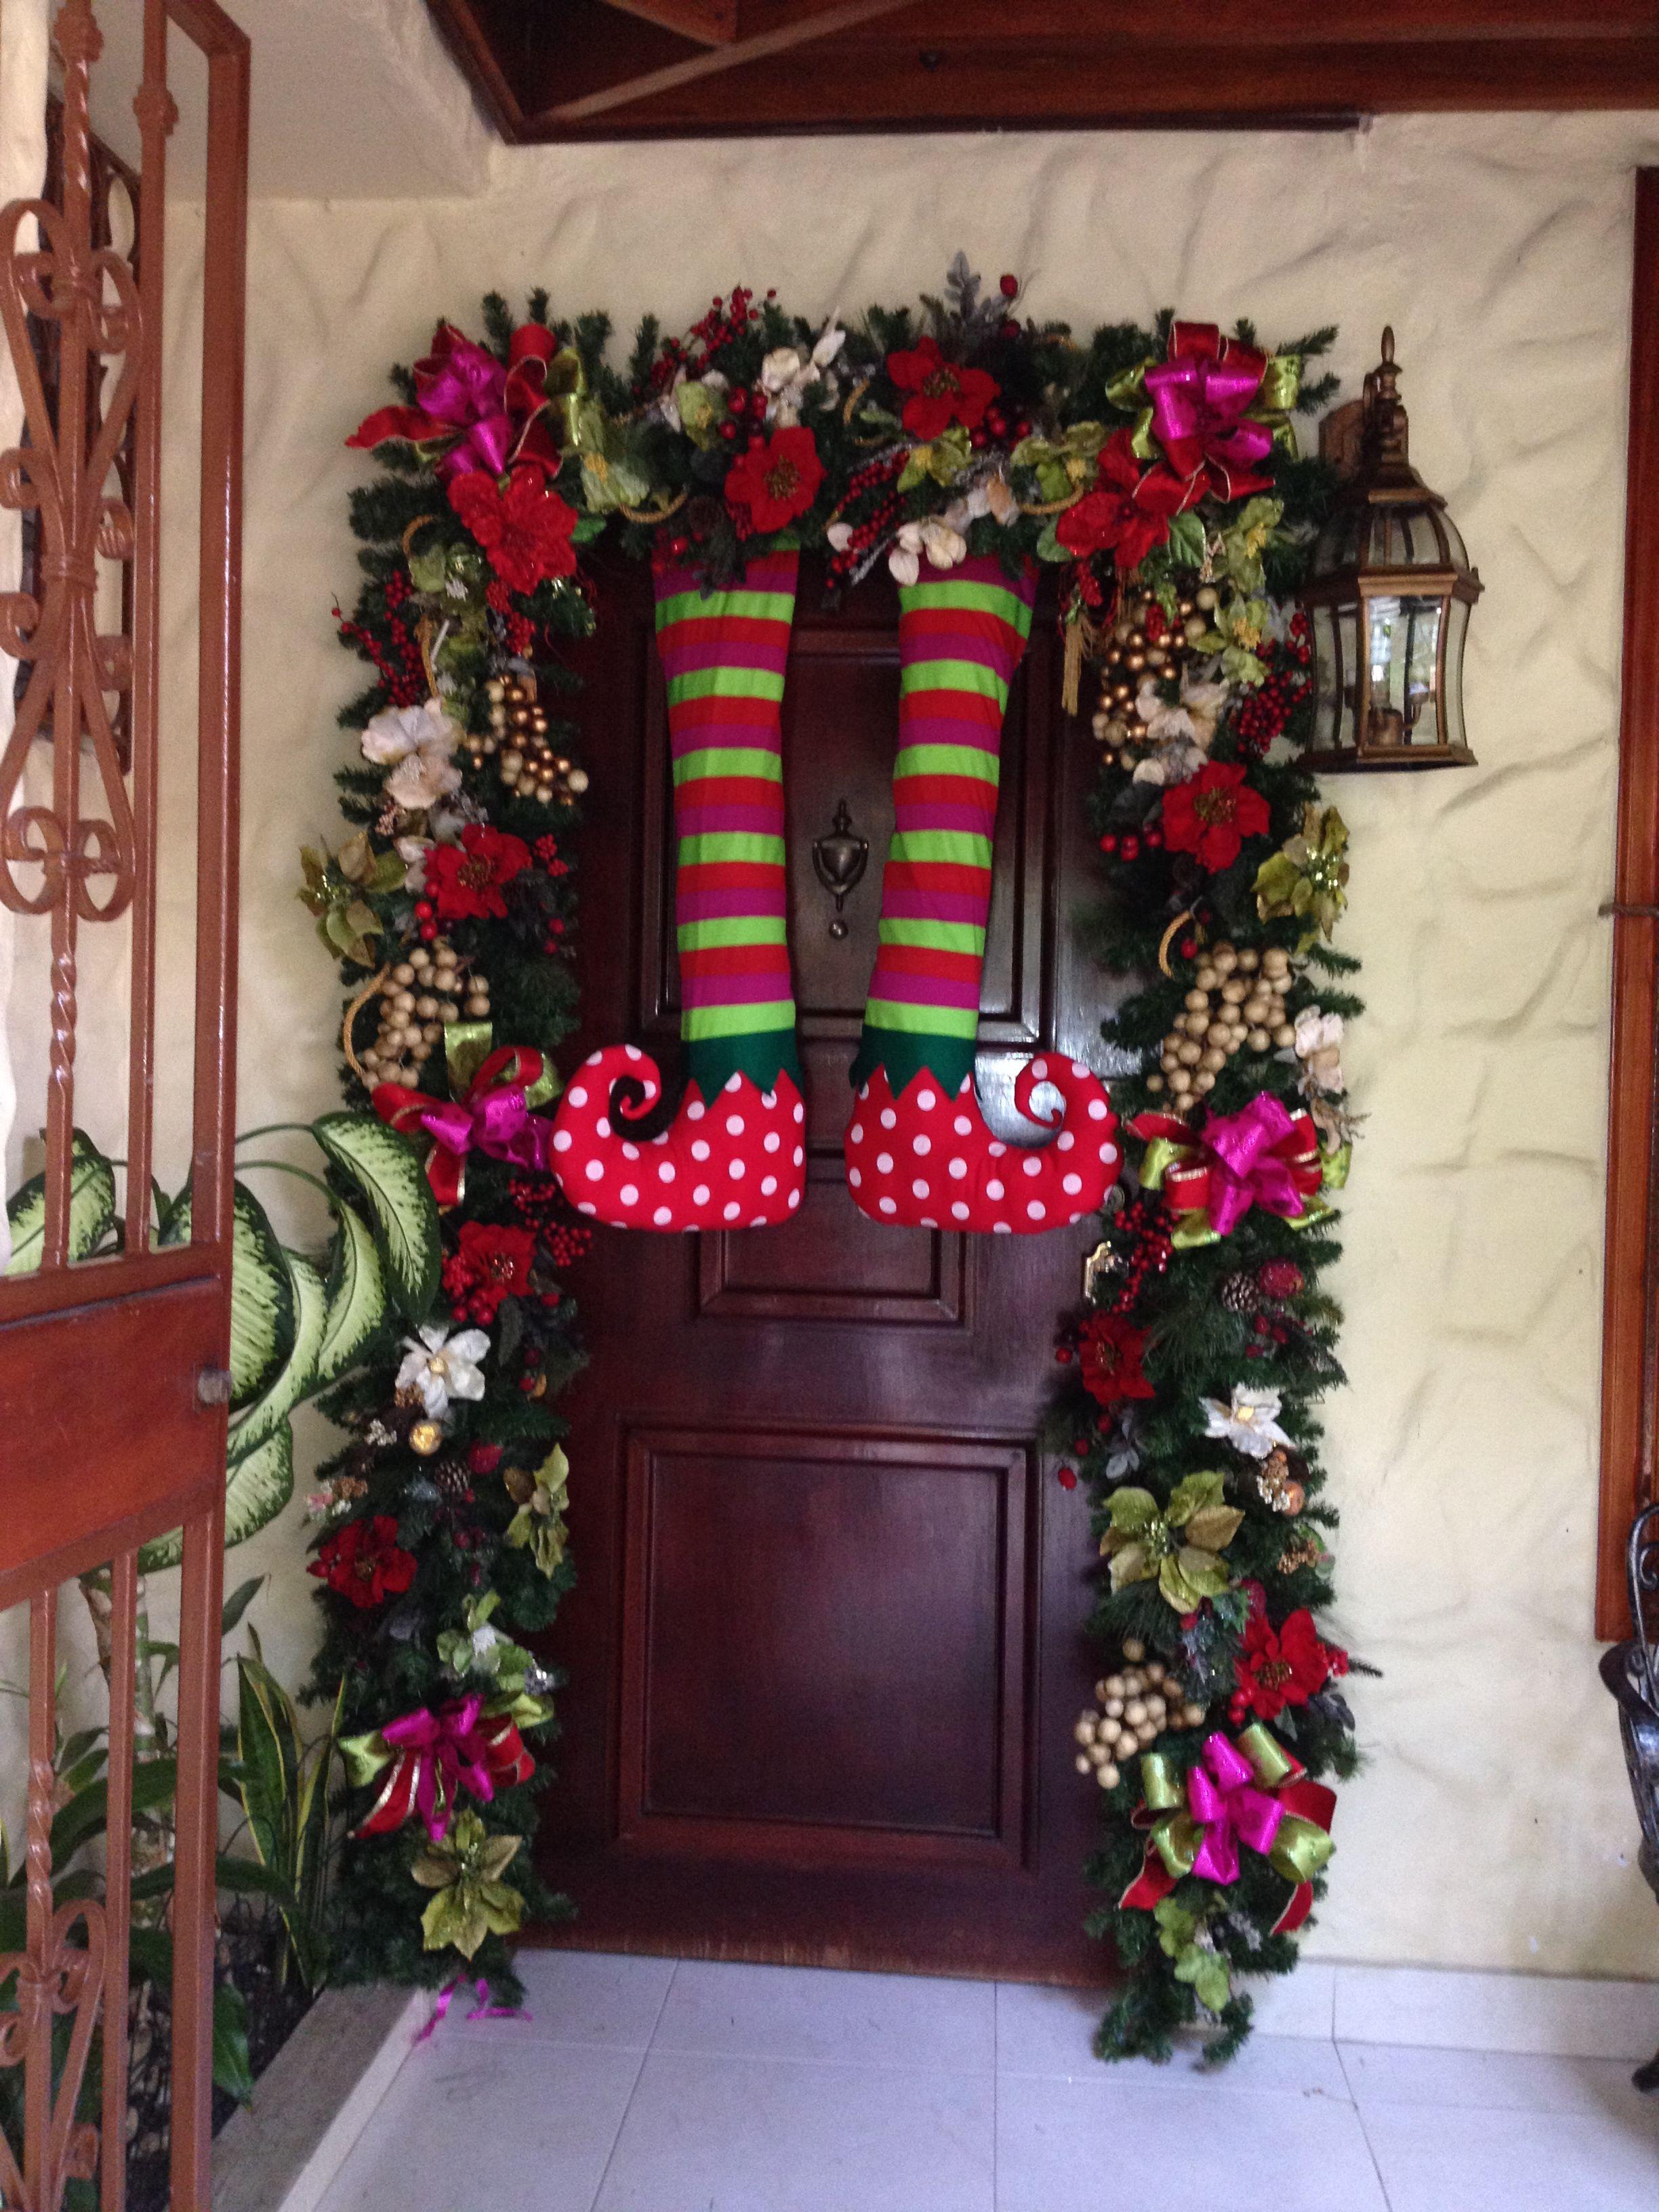 Puerta decorada navidad ideas para navidad decoracion - Decoracion de unas para navidad ...